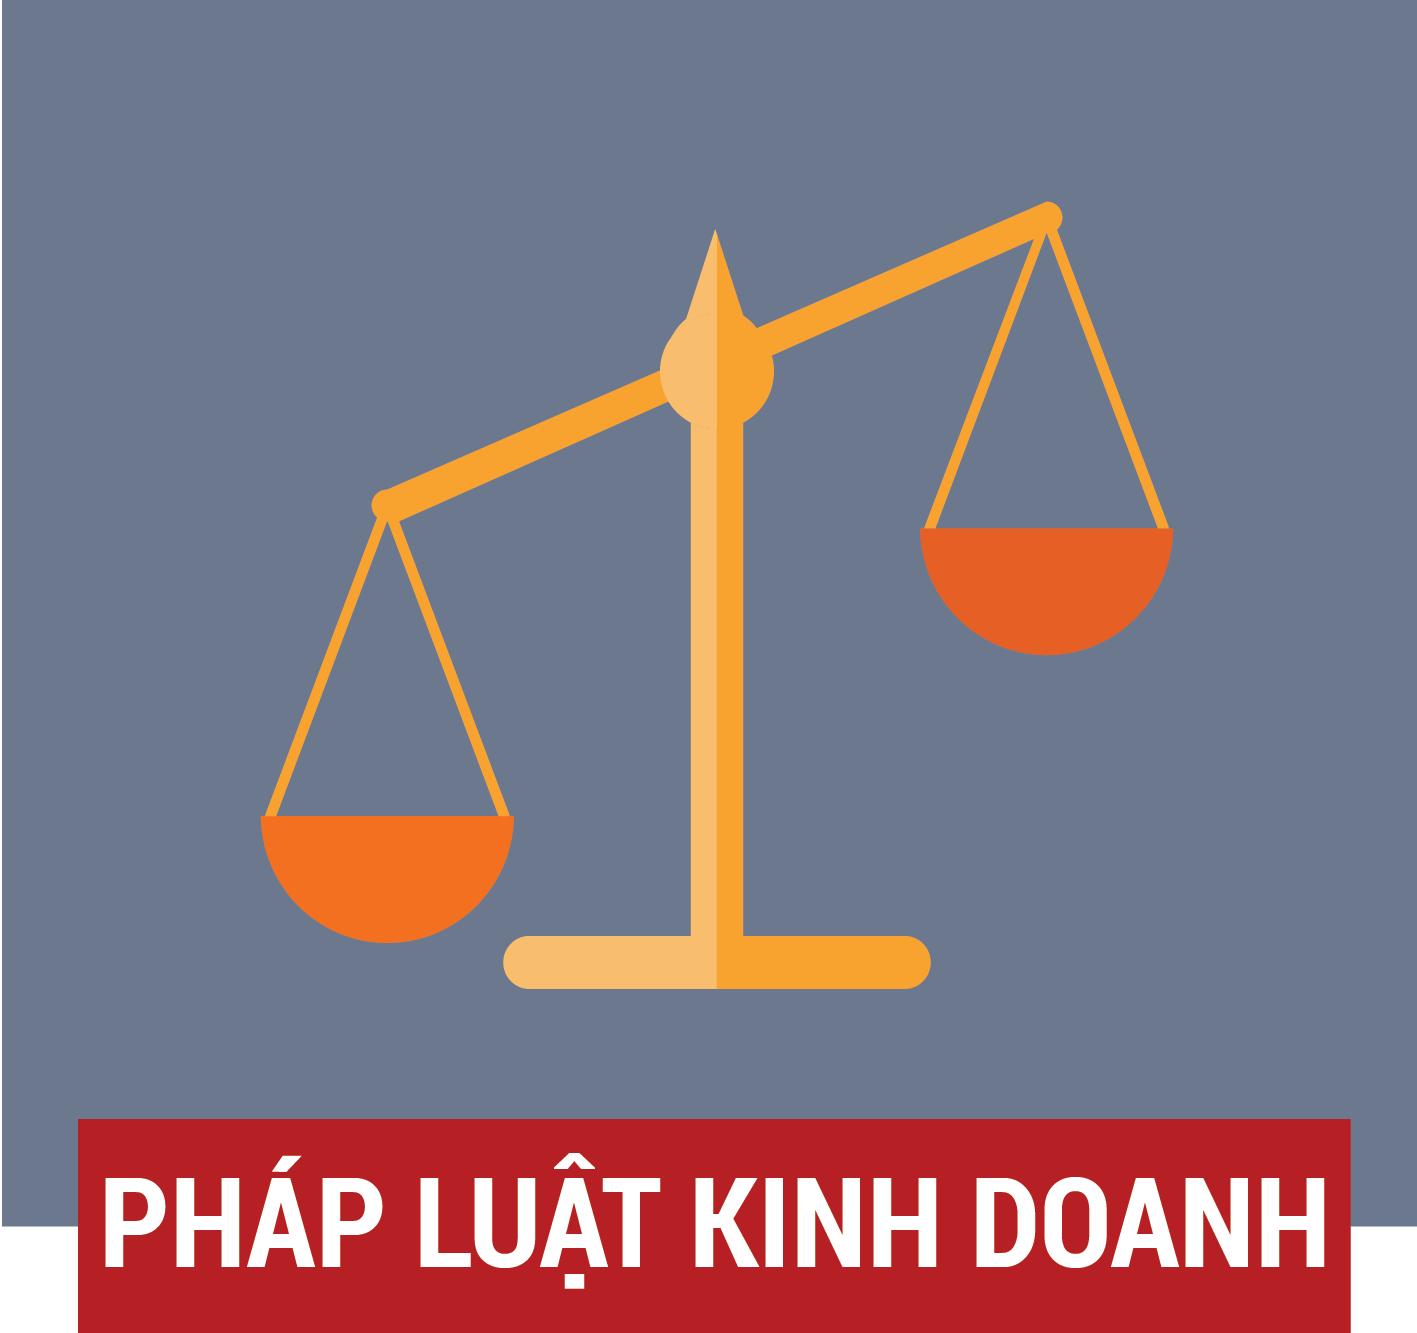 Pháp luật kinh doanh